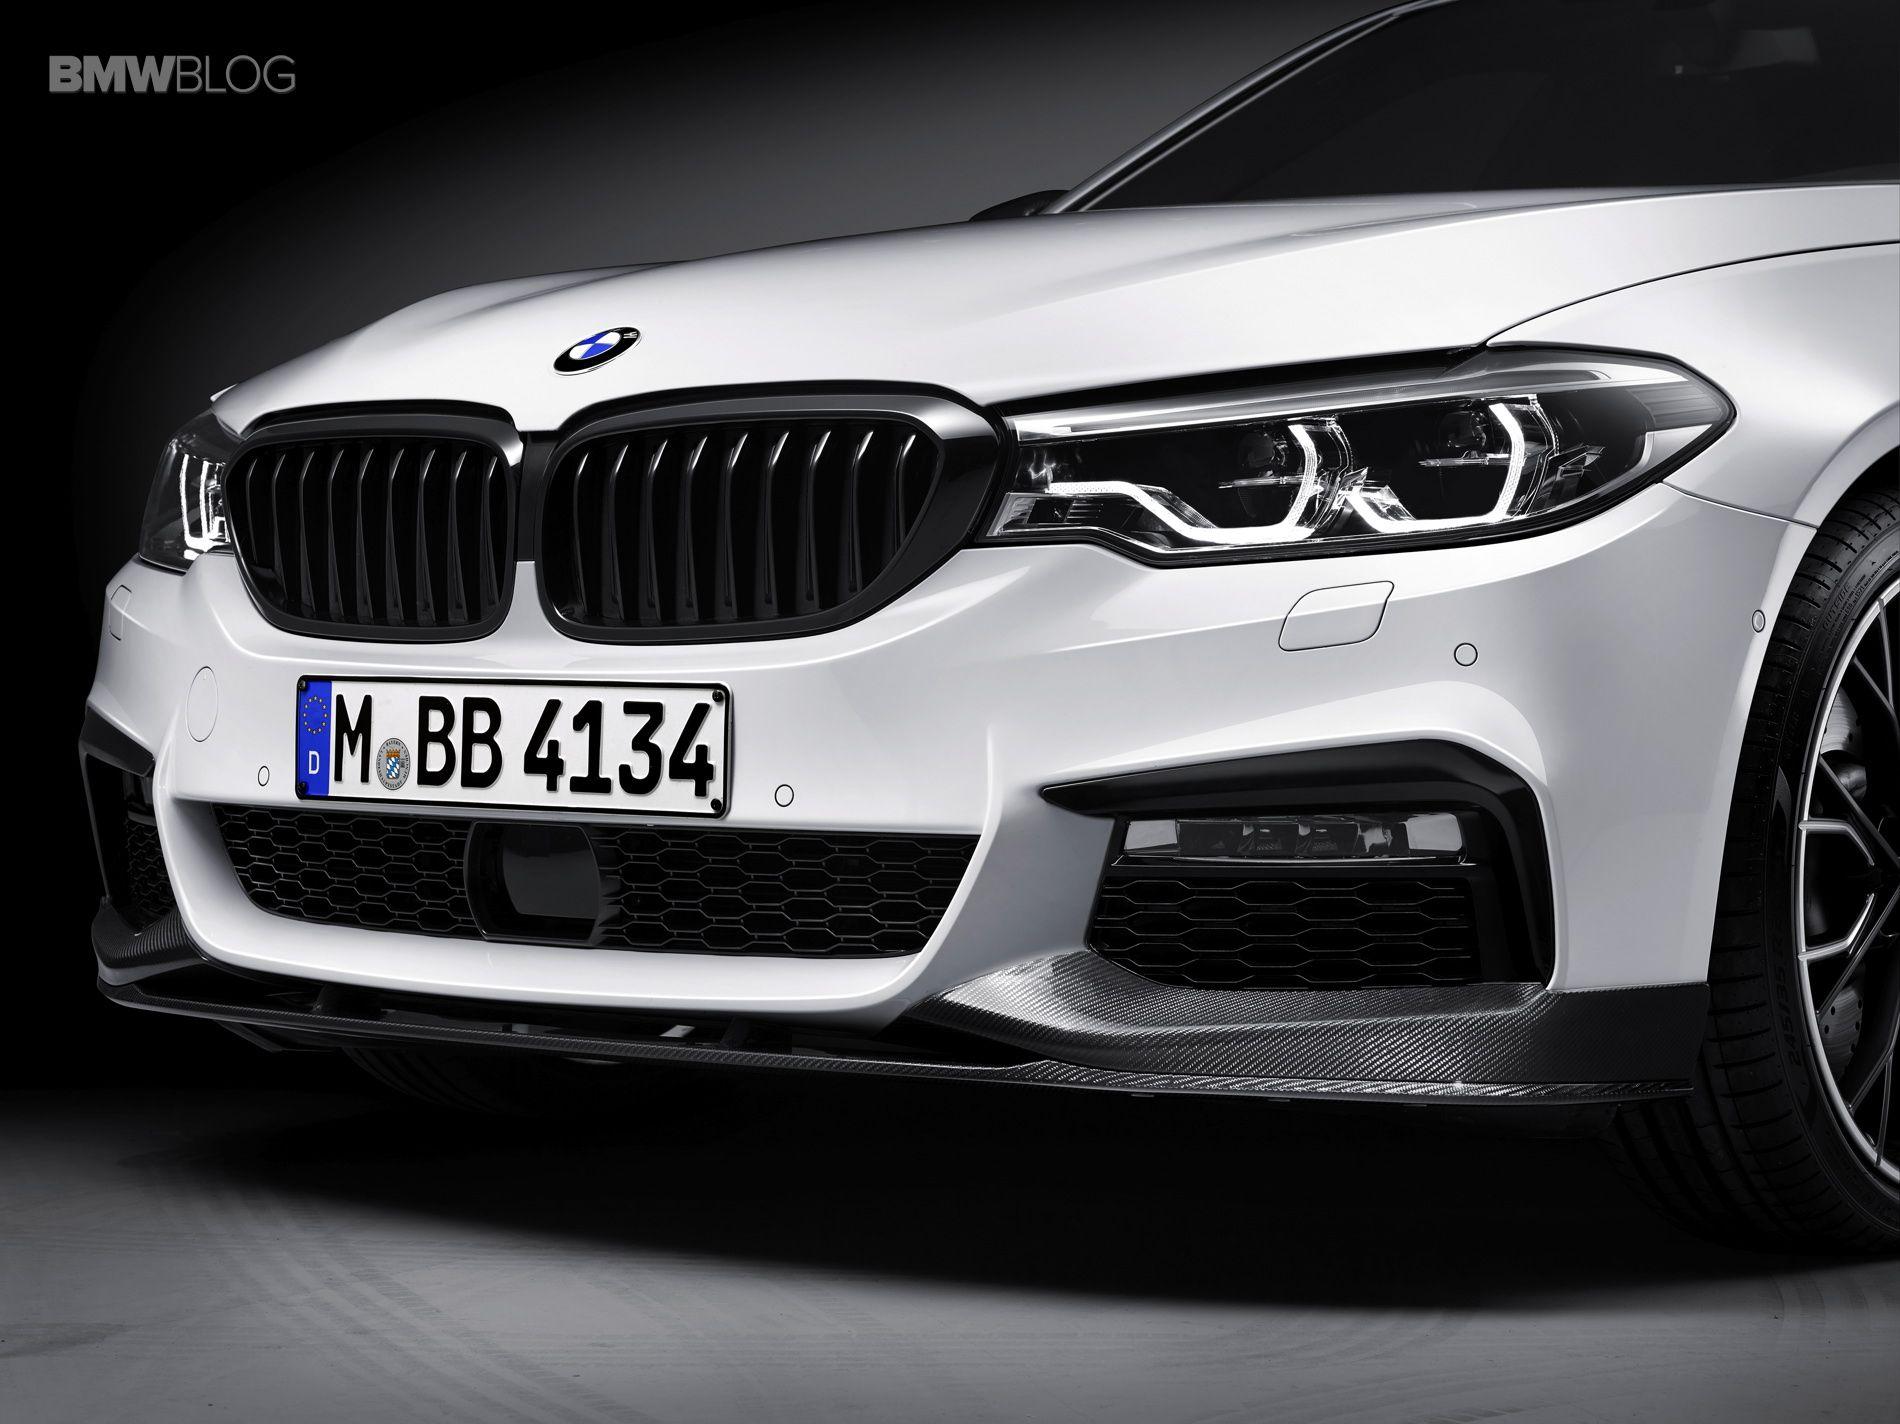 World Premiere: 2017 BMW 5 Series Sedan with M Performance